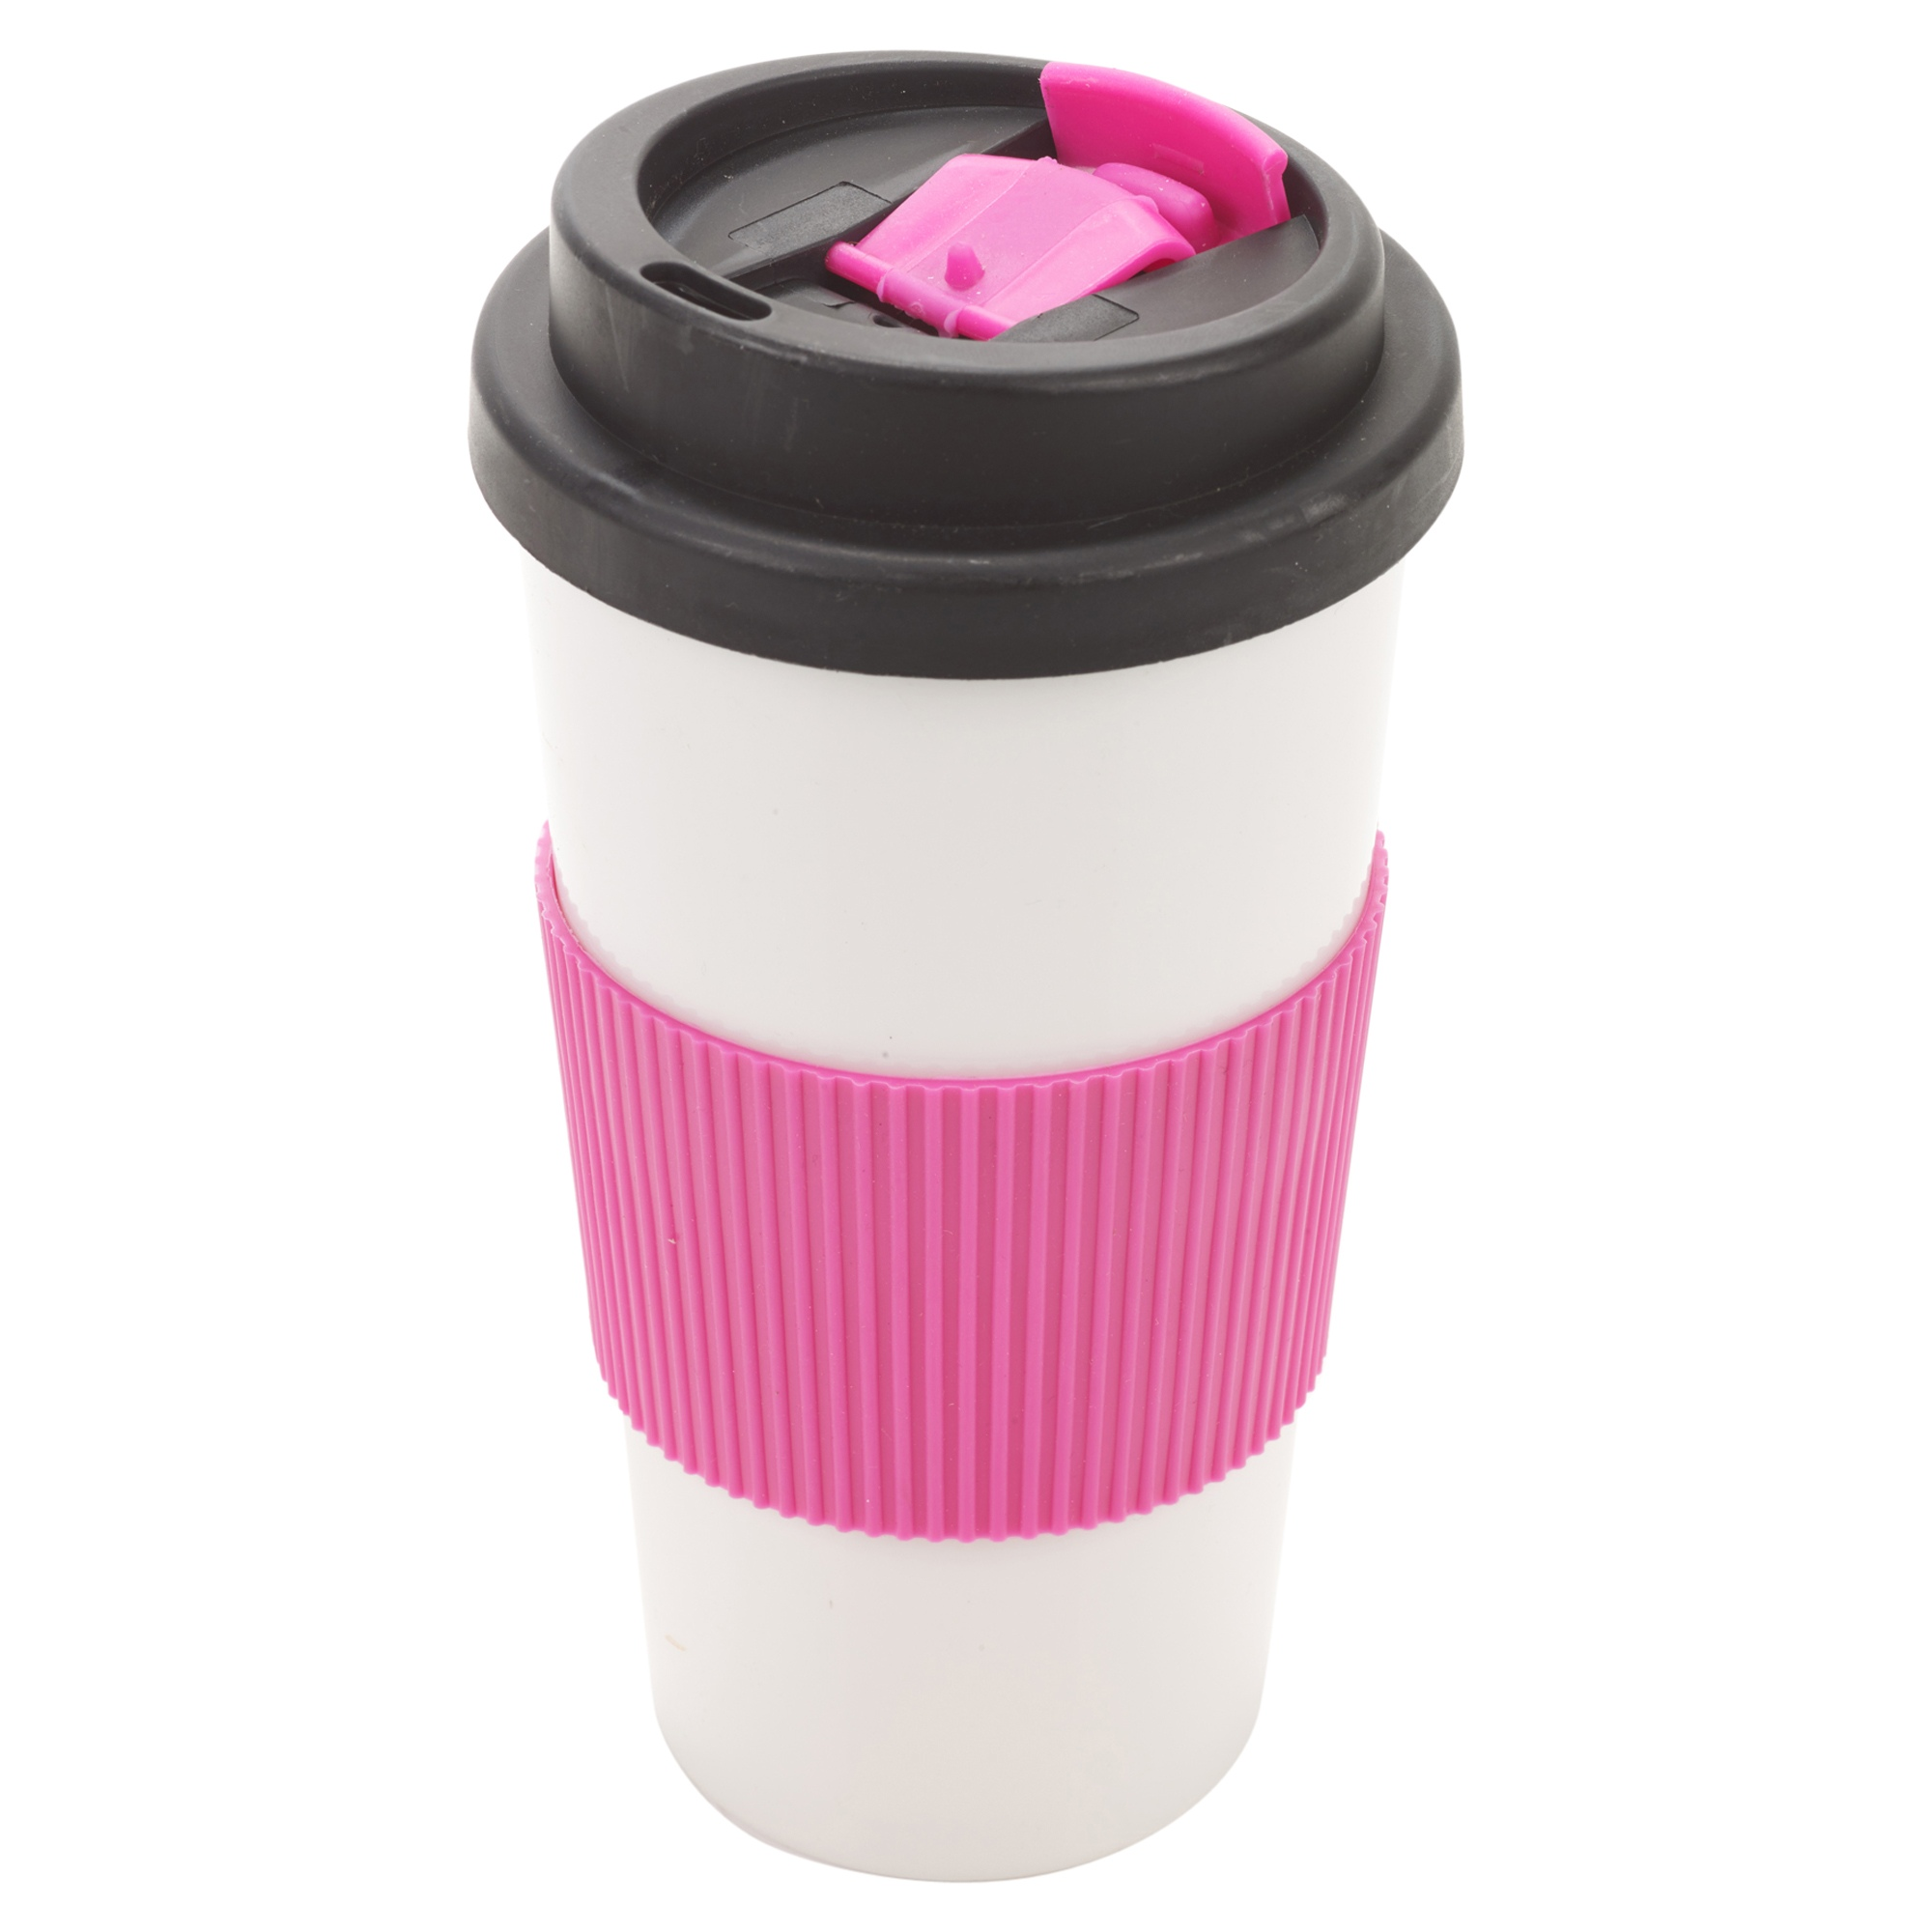 500ml double wall drinking warm cup coffee tea travel thermal mug screw on lid ebay. Black Bedroom Furniture Sets. Home Design Ideas